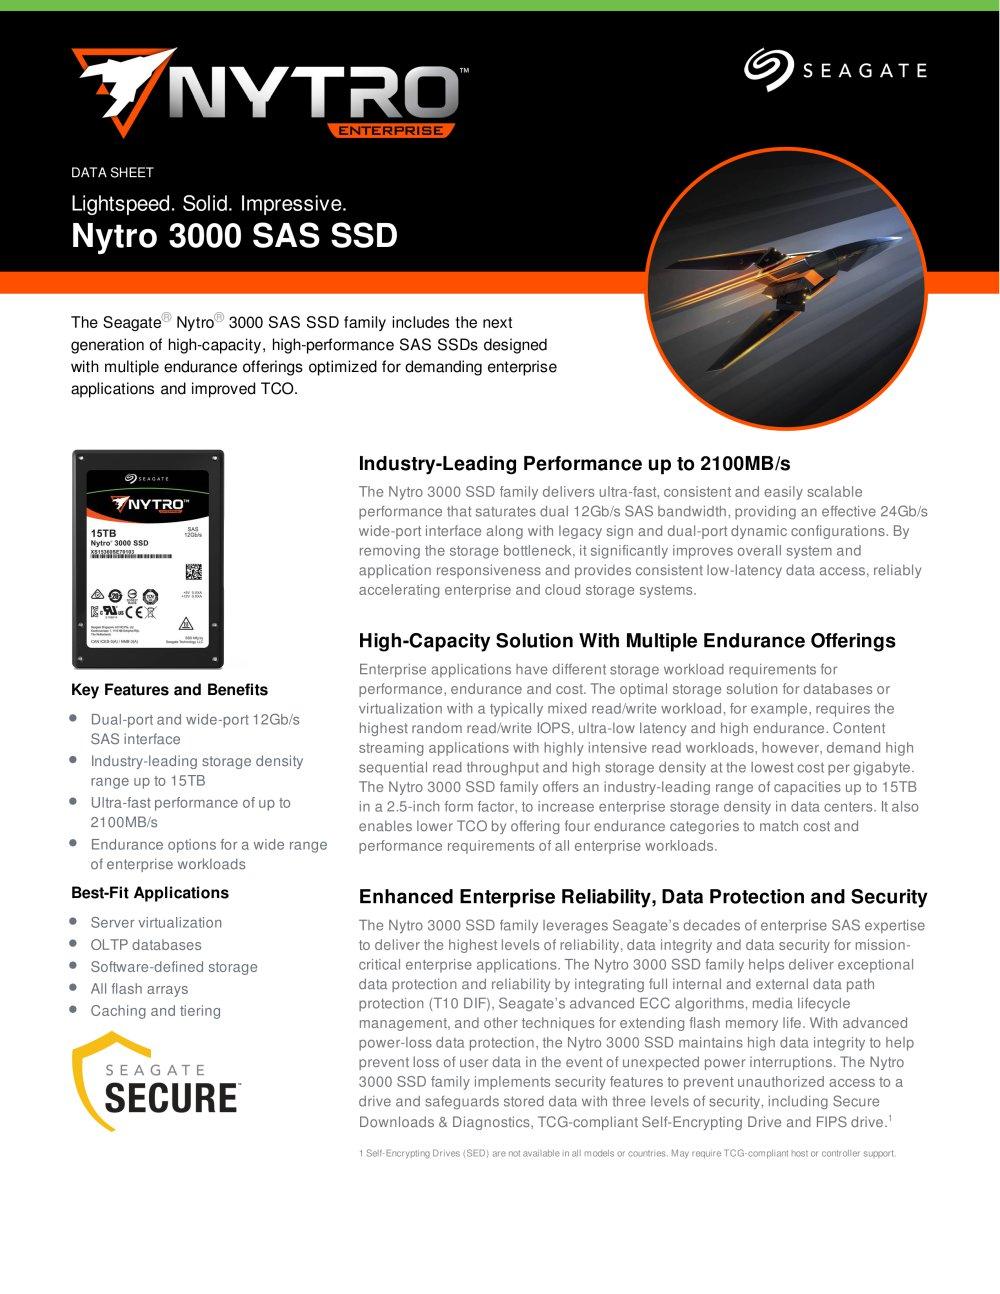 Nytro 3000 Sas Ssd Seagate Pdf Catalogue Technical Sata Controller With Encryption 1 6 Pages